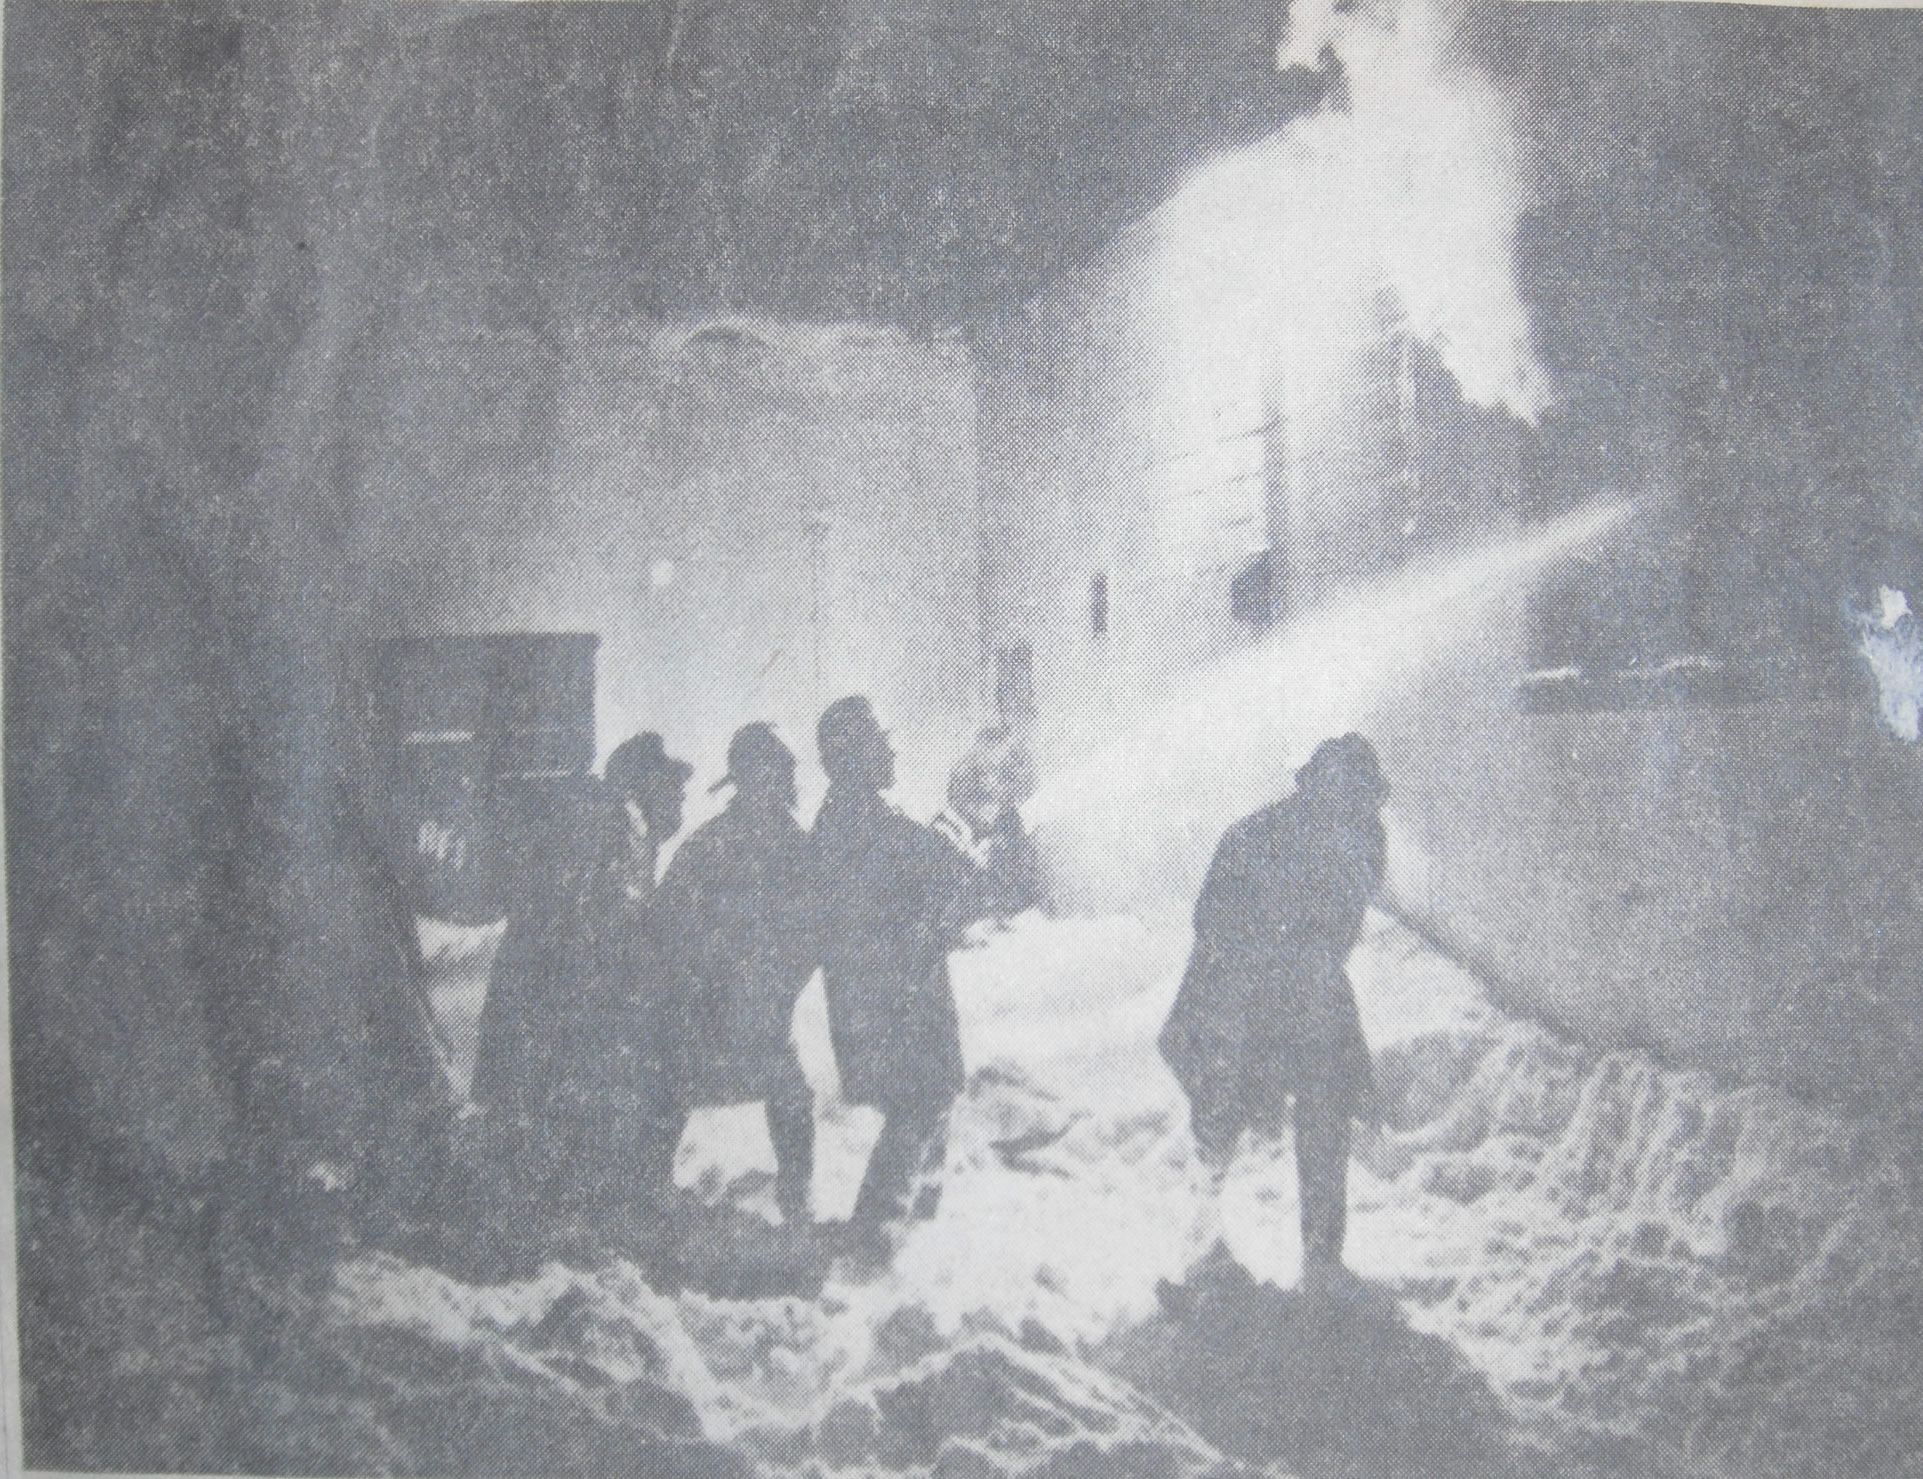 Firemen waded through knee-deep snow to fight a blaze